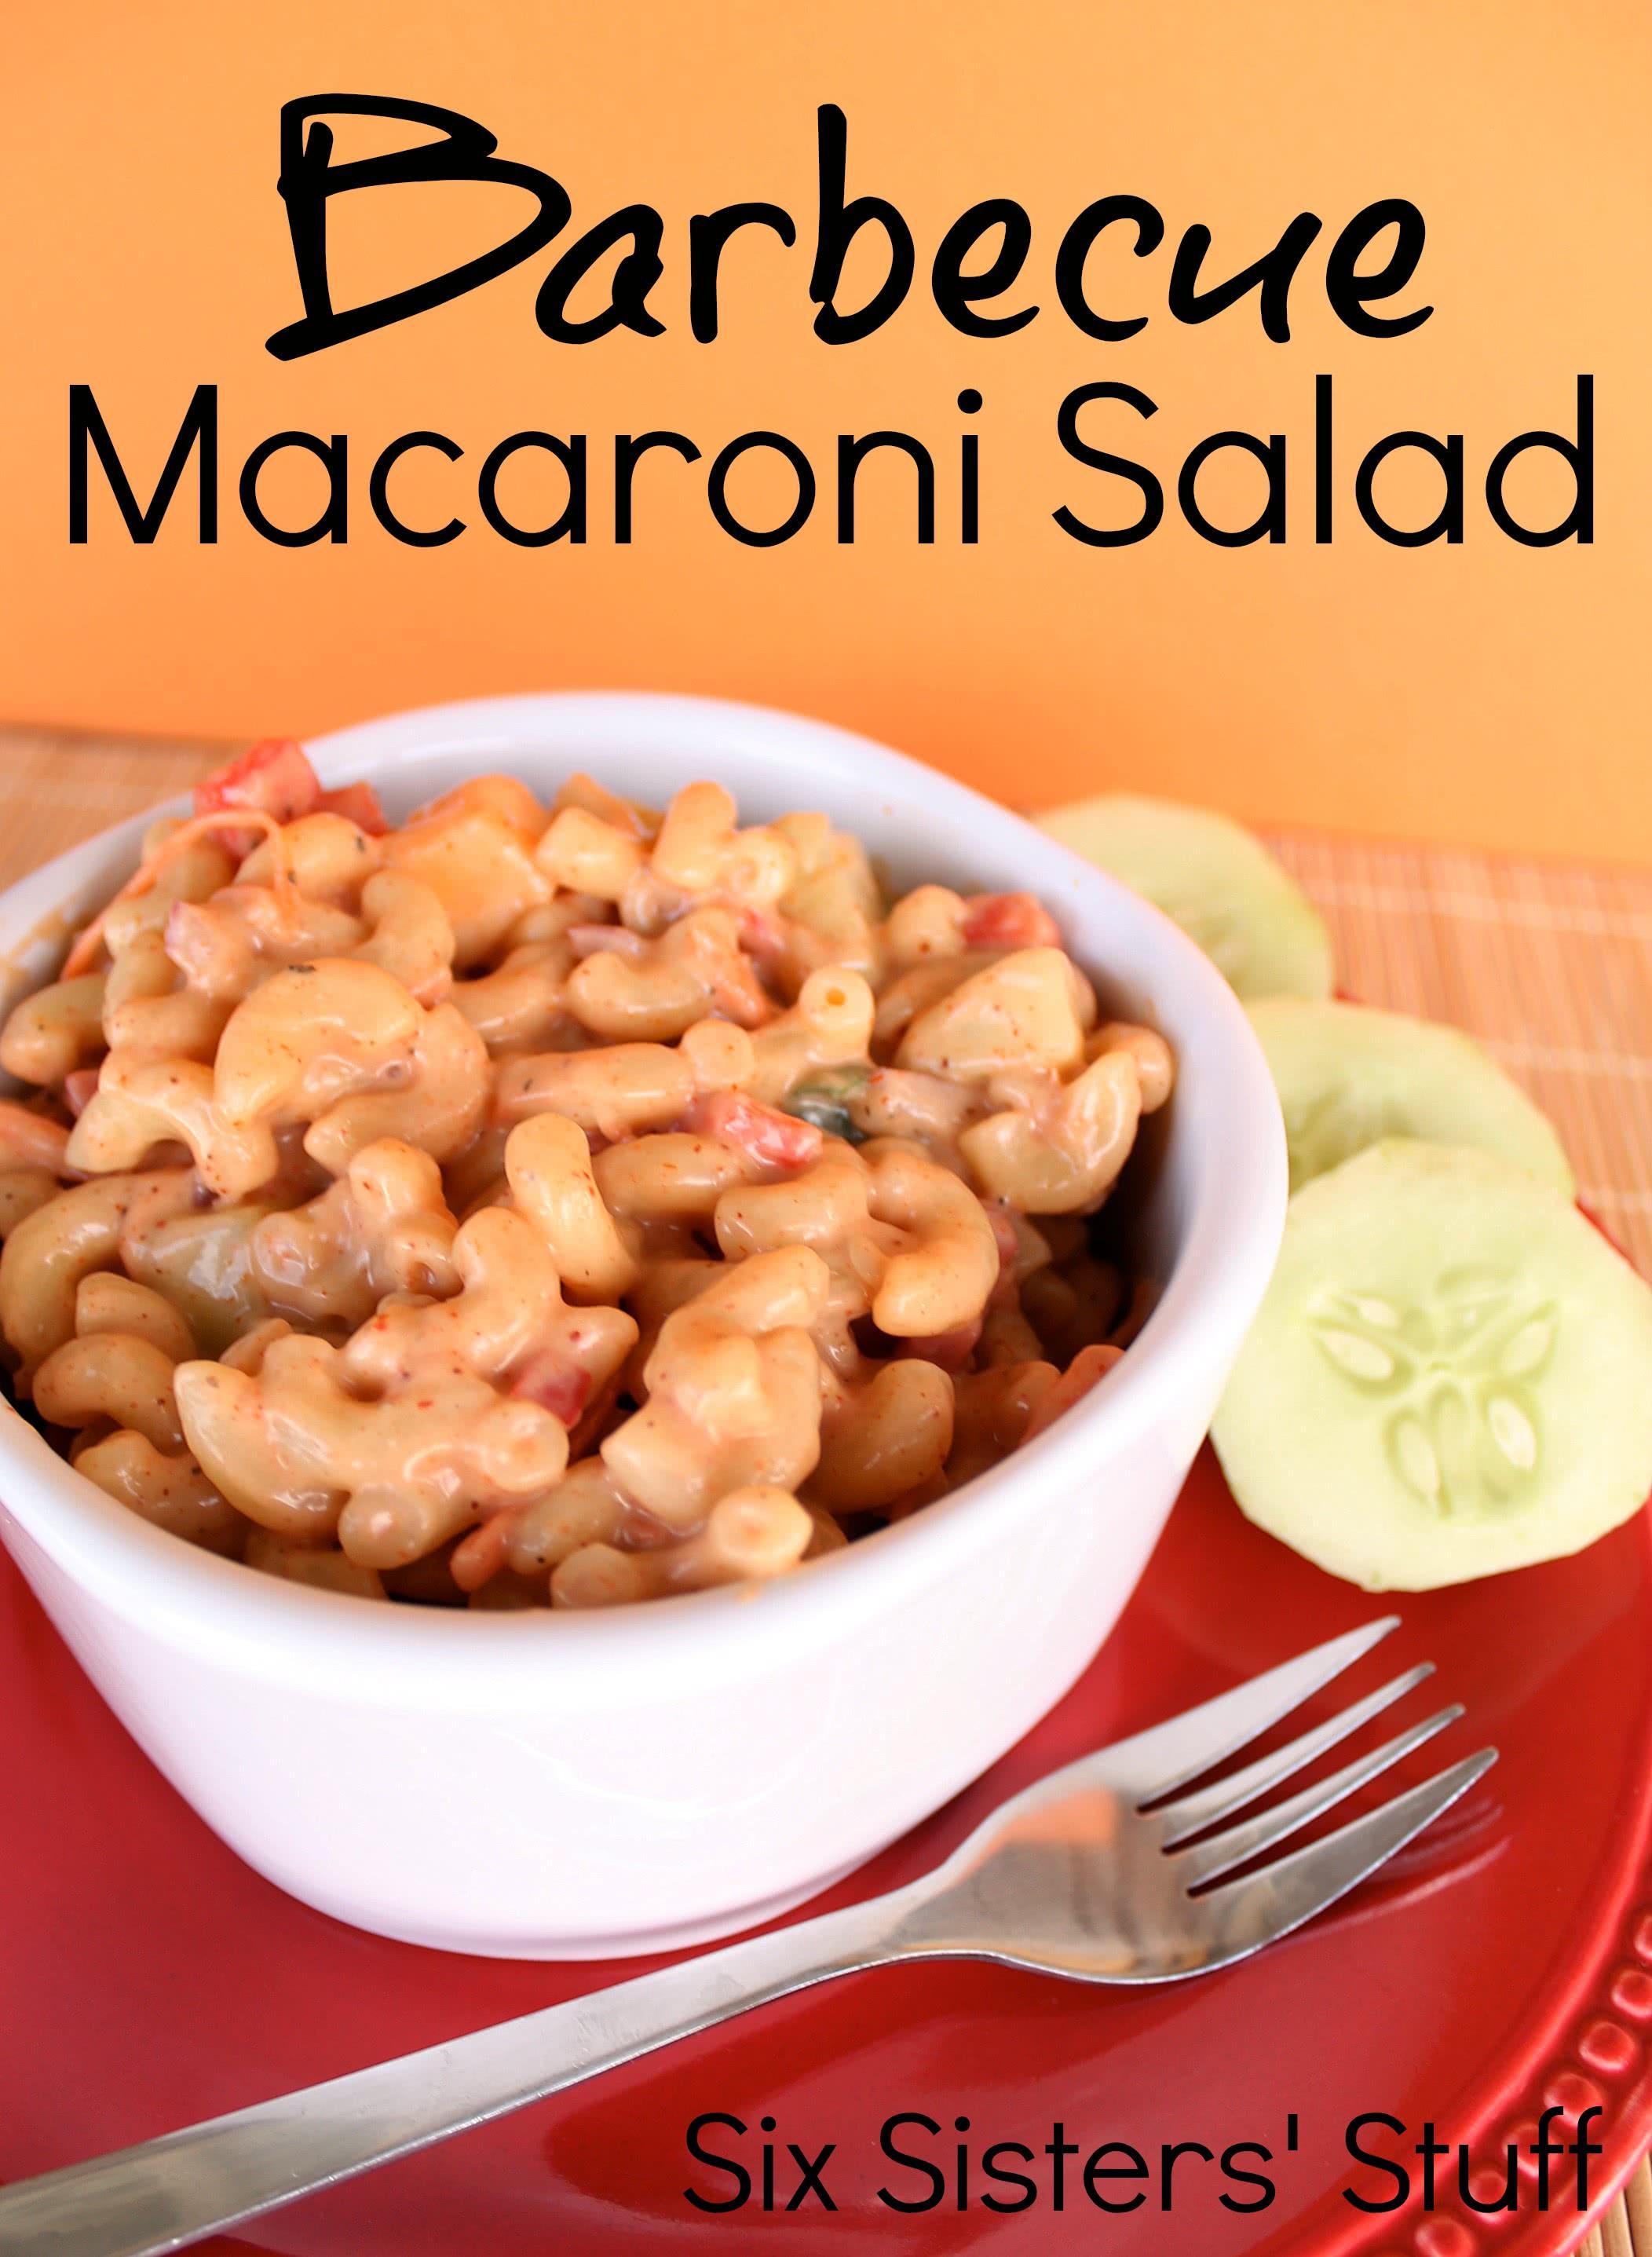 Barbecue Macaroni Salad Recipe